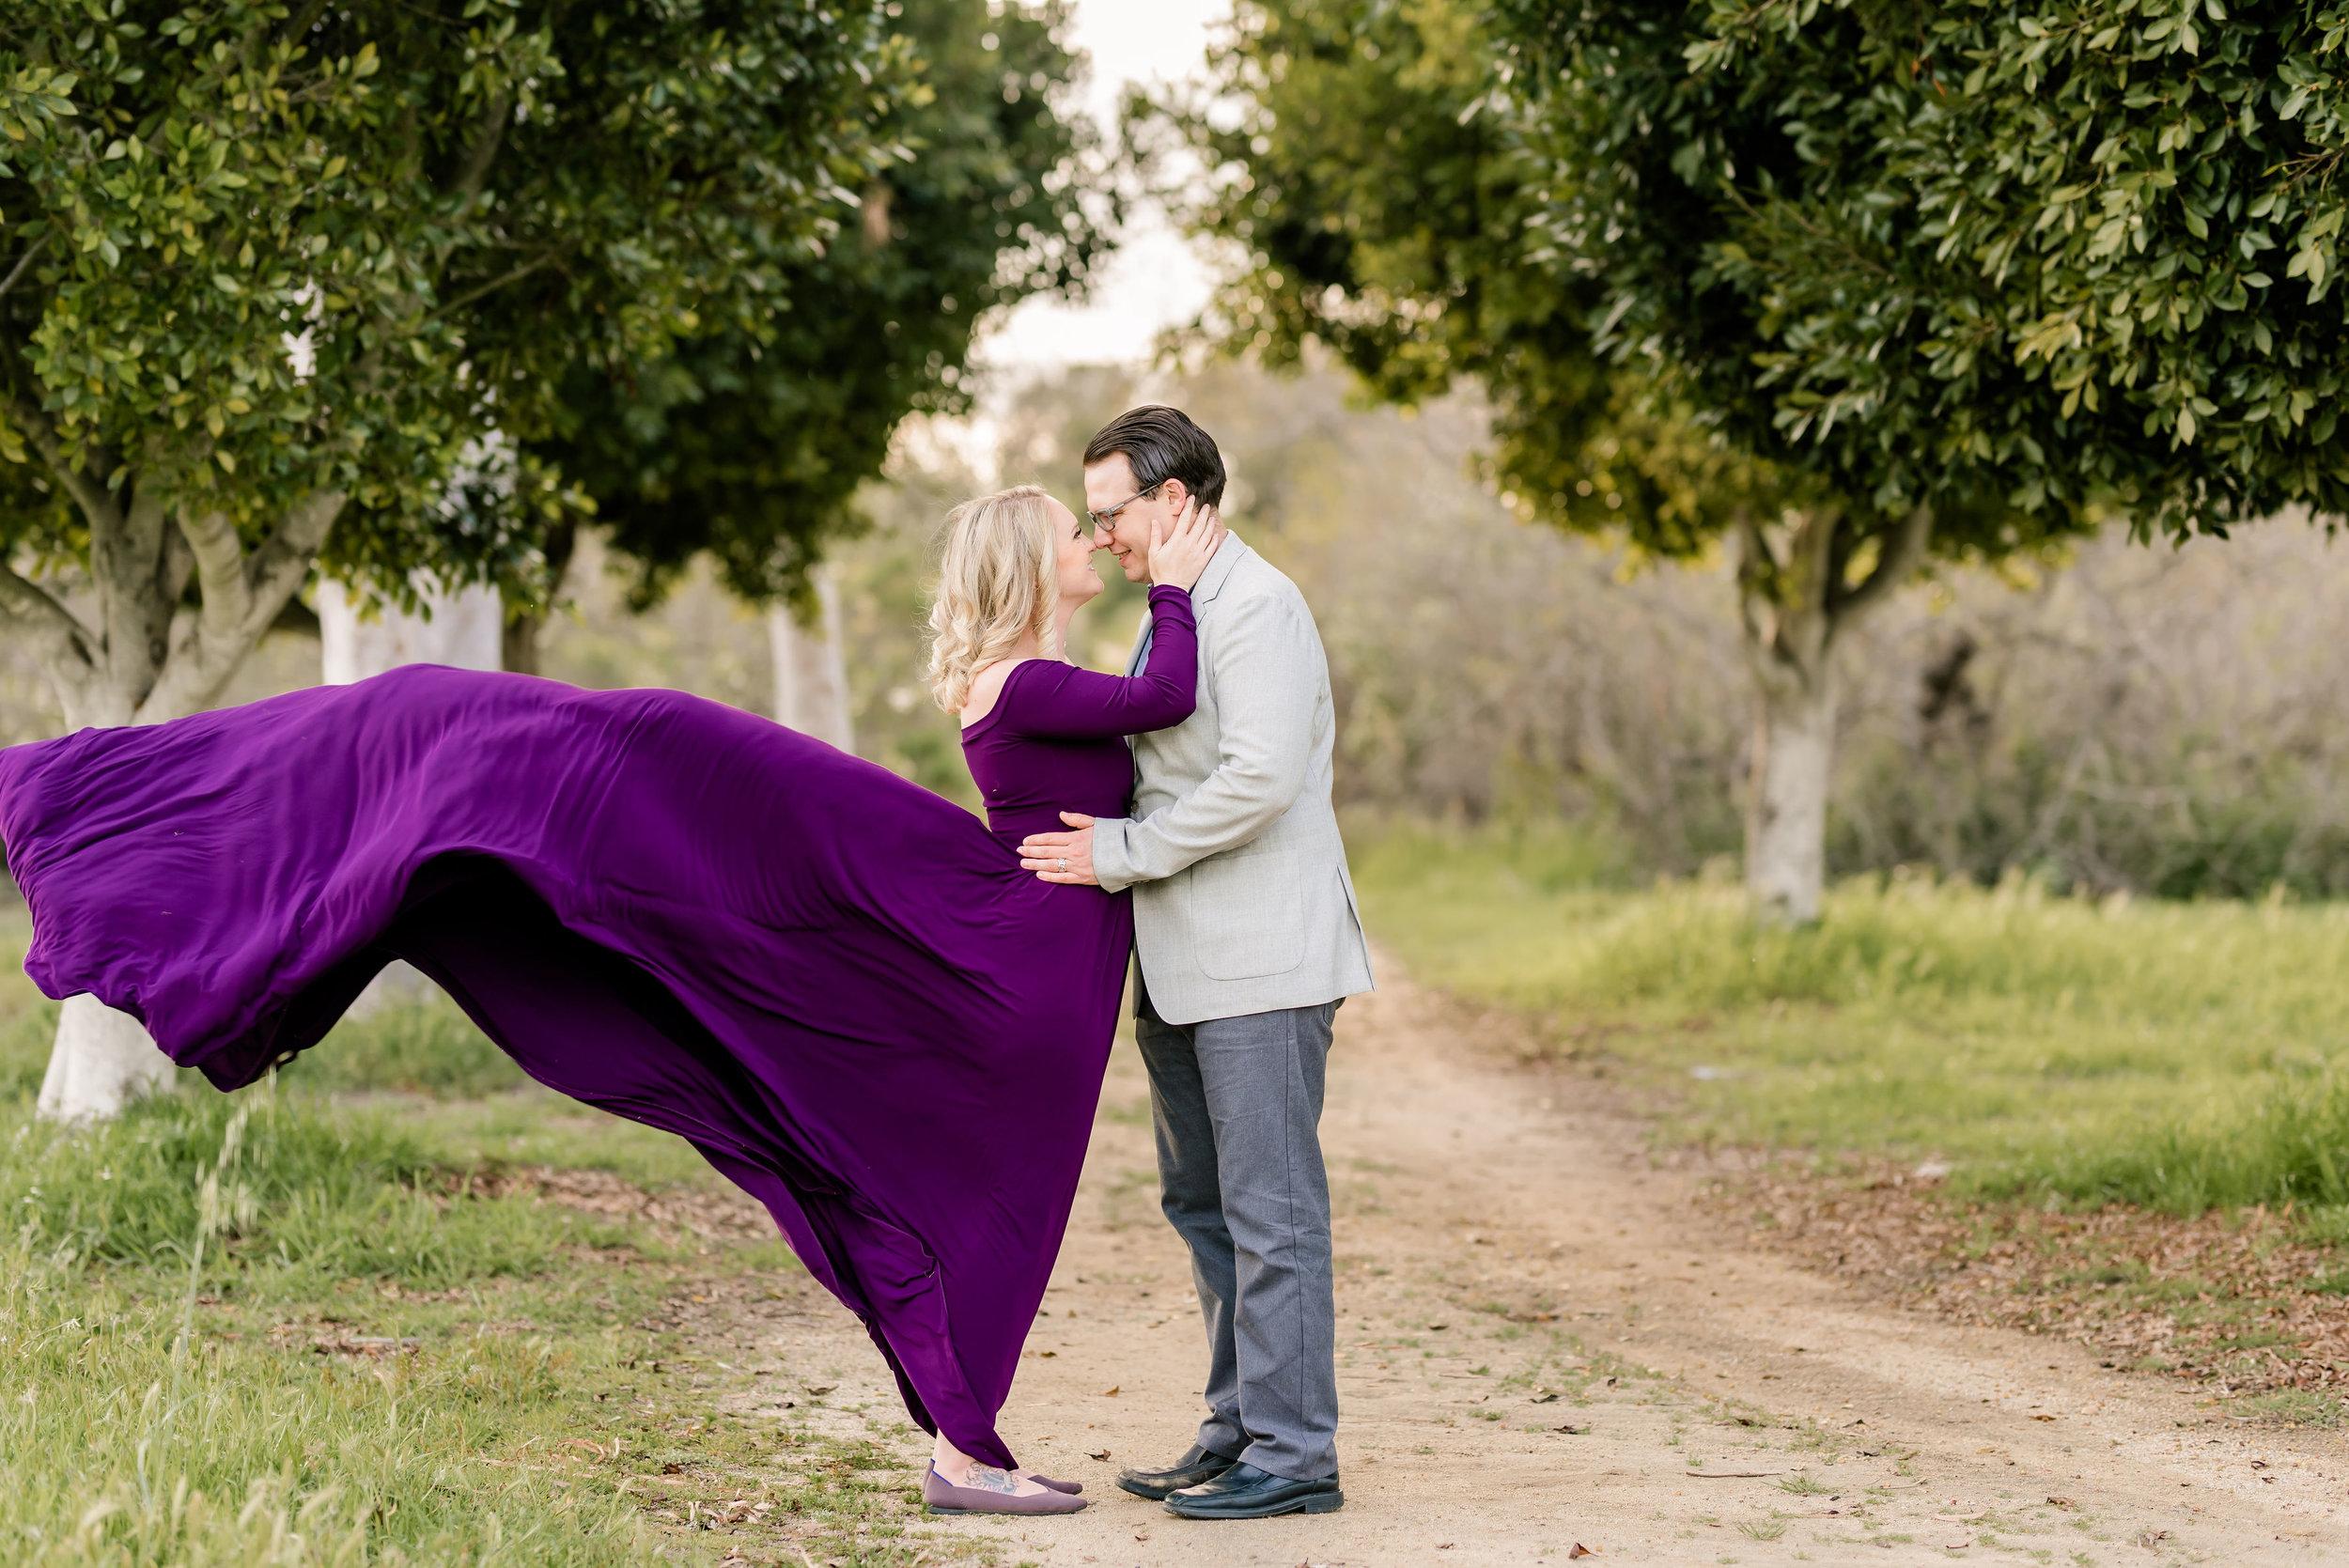 Ann Vestal Wedding Photographer